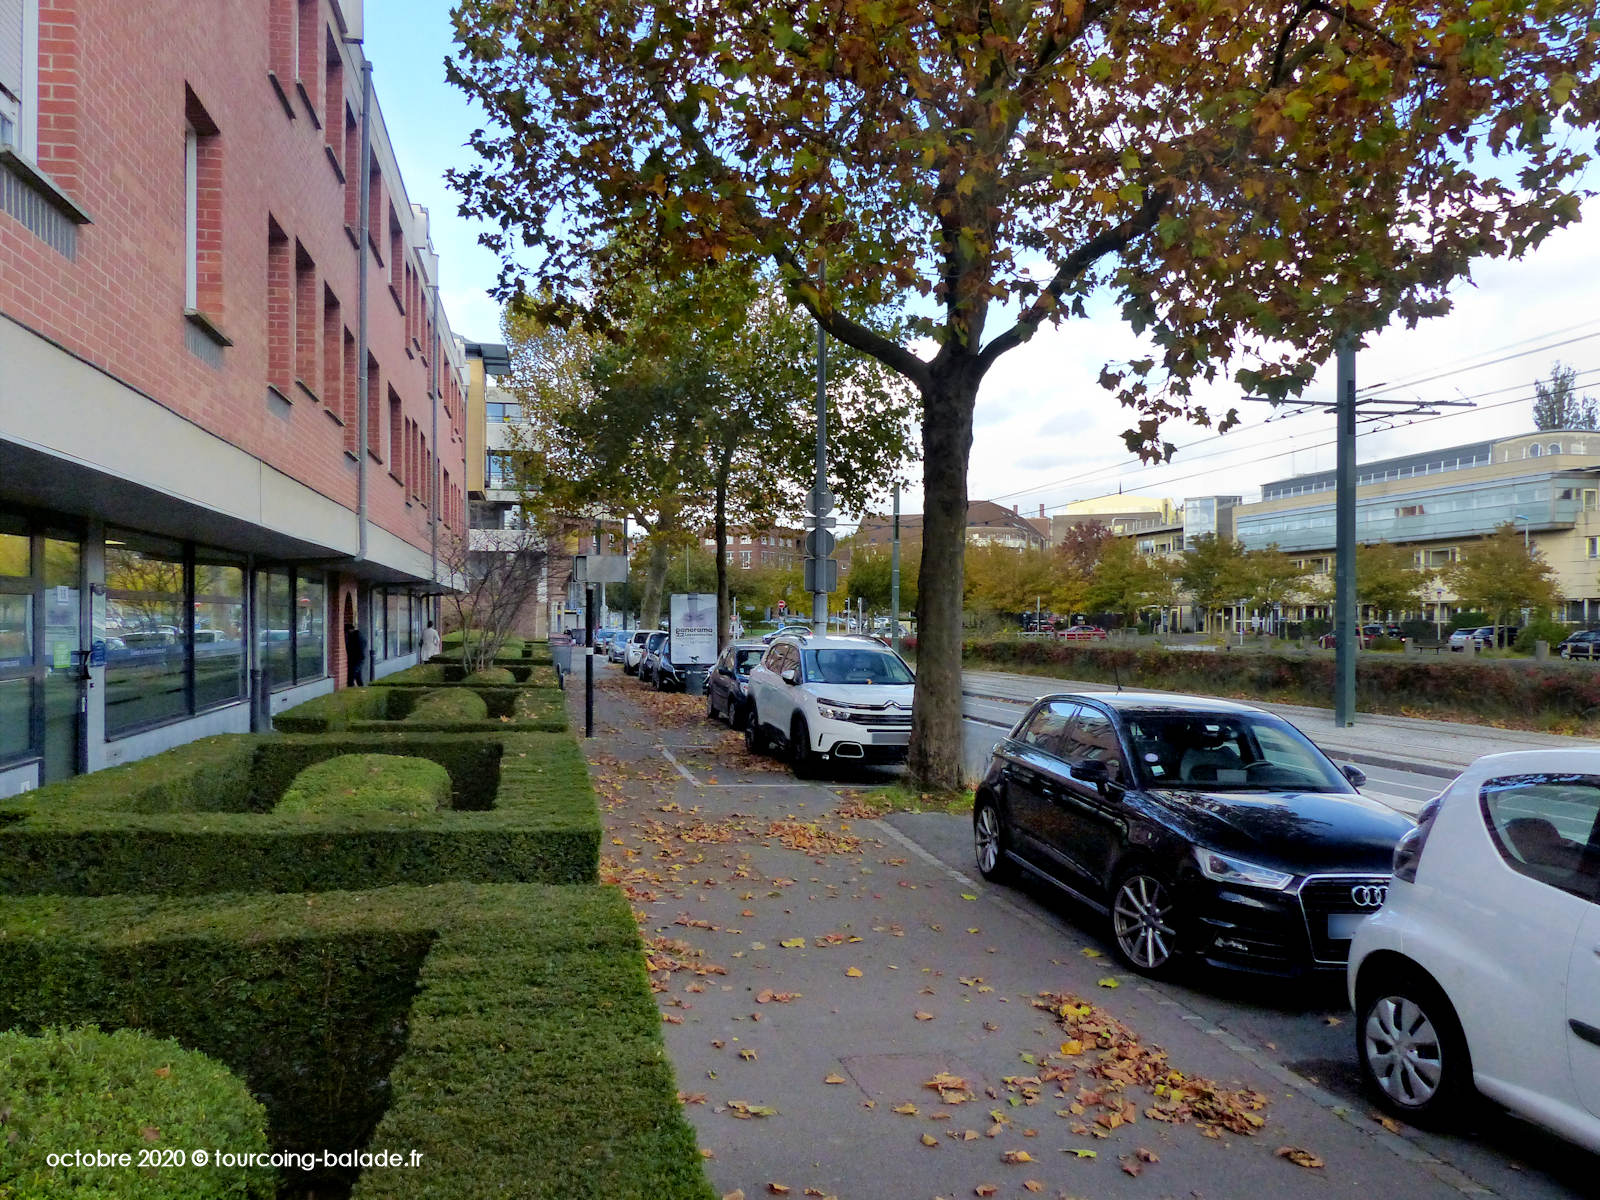 Quai de Cherbourg, Tourcoing 2020